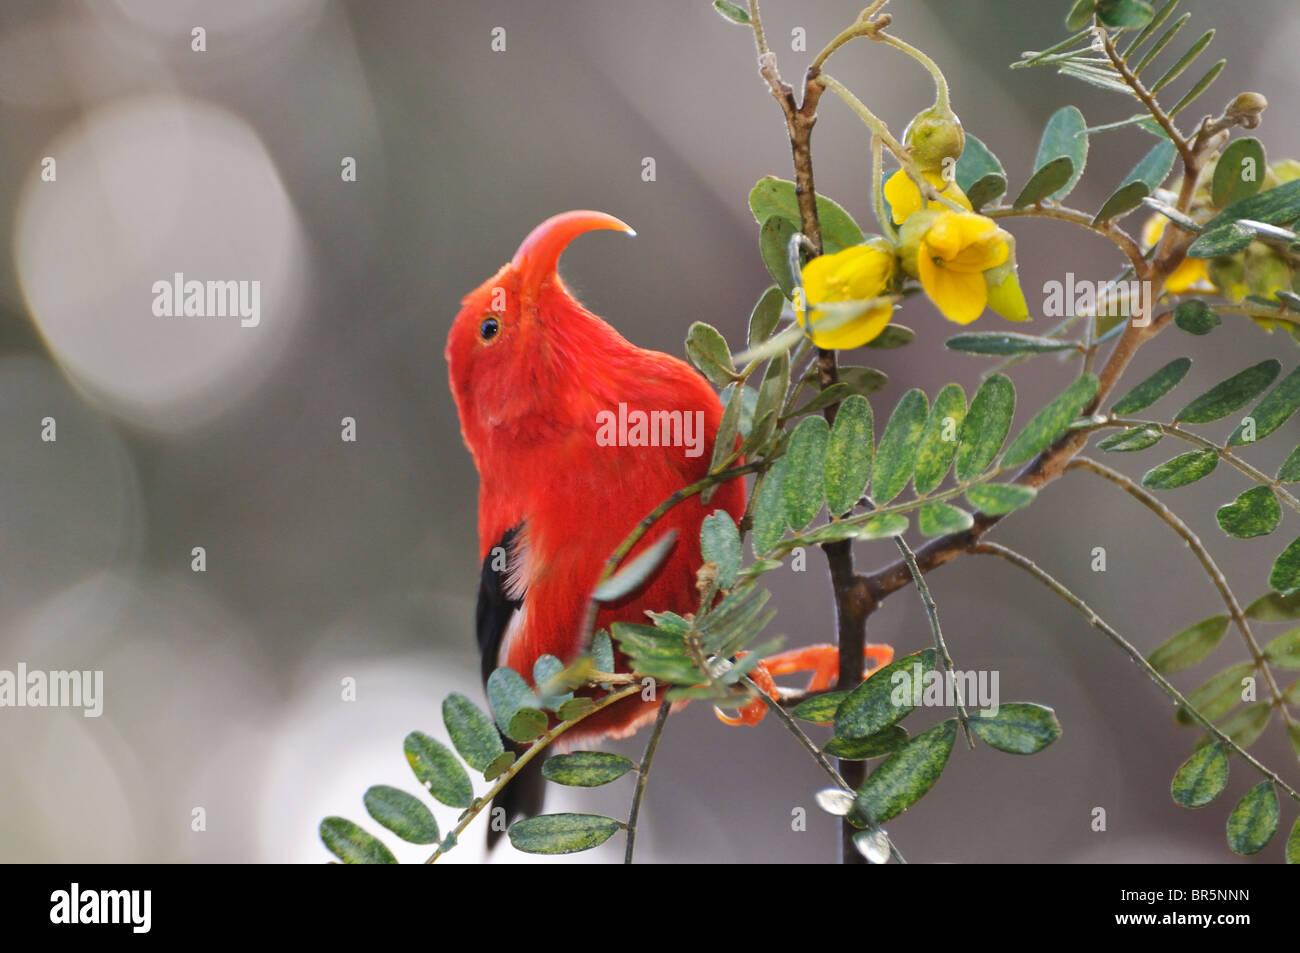 """IWI Vogel - Hawaiian Kleidervogel - extrahieren von Nektar, Maui, Hawaii-Inseln, Hawaii, USA. Stockbild"